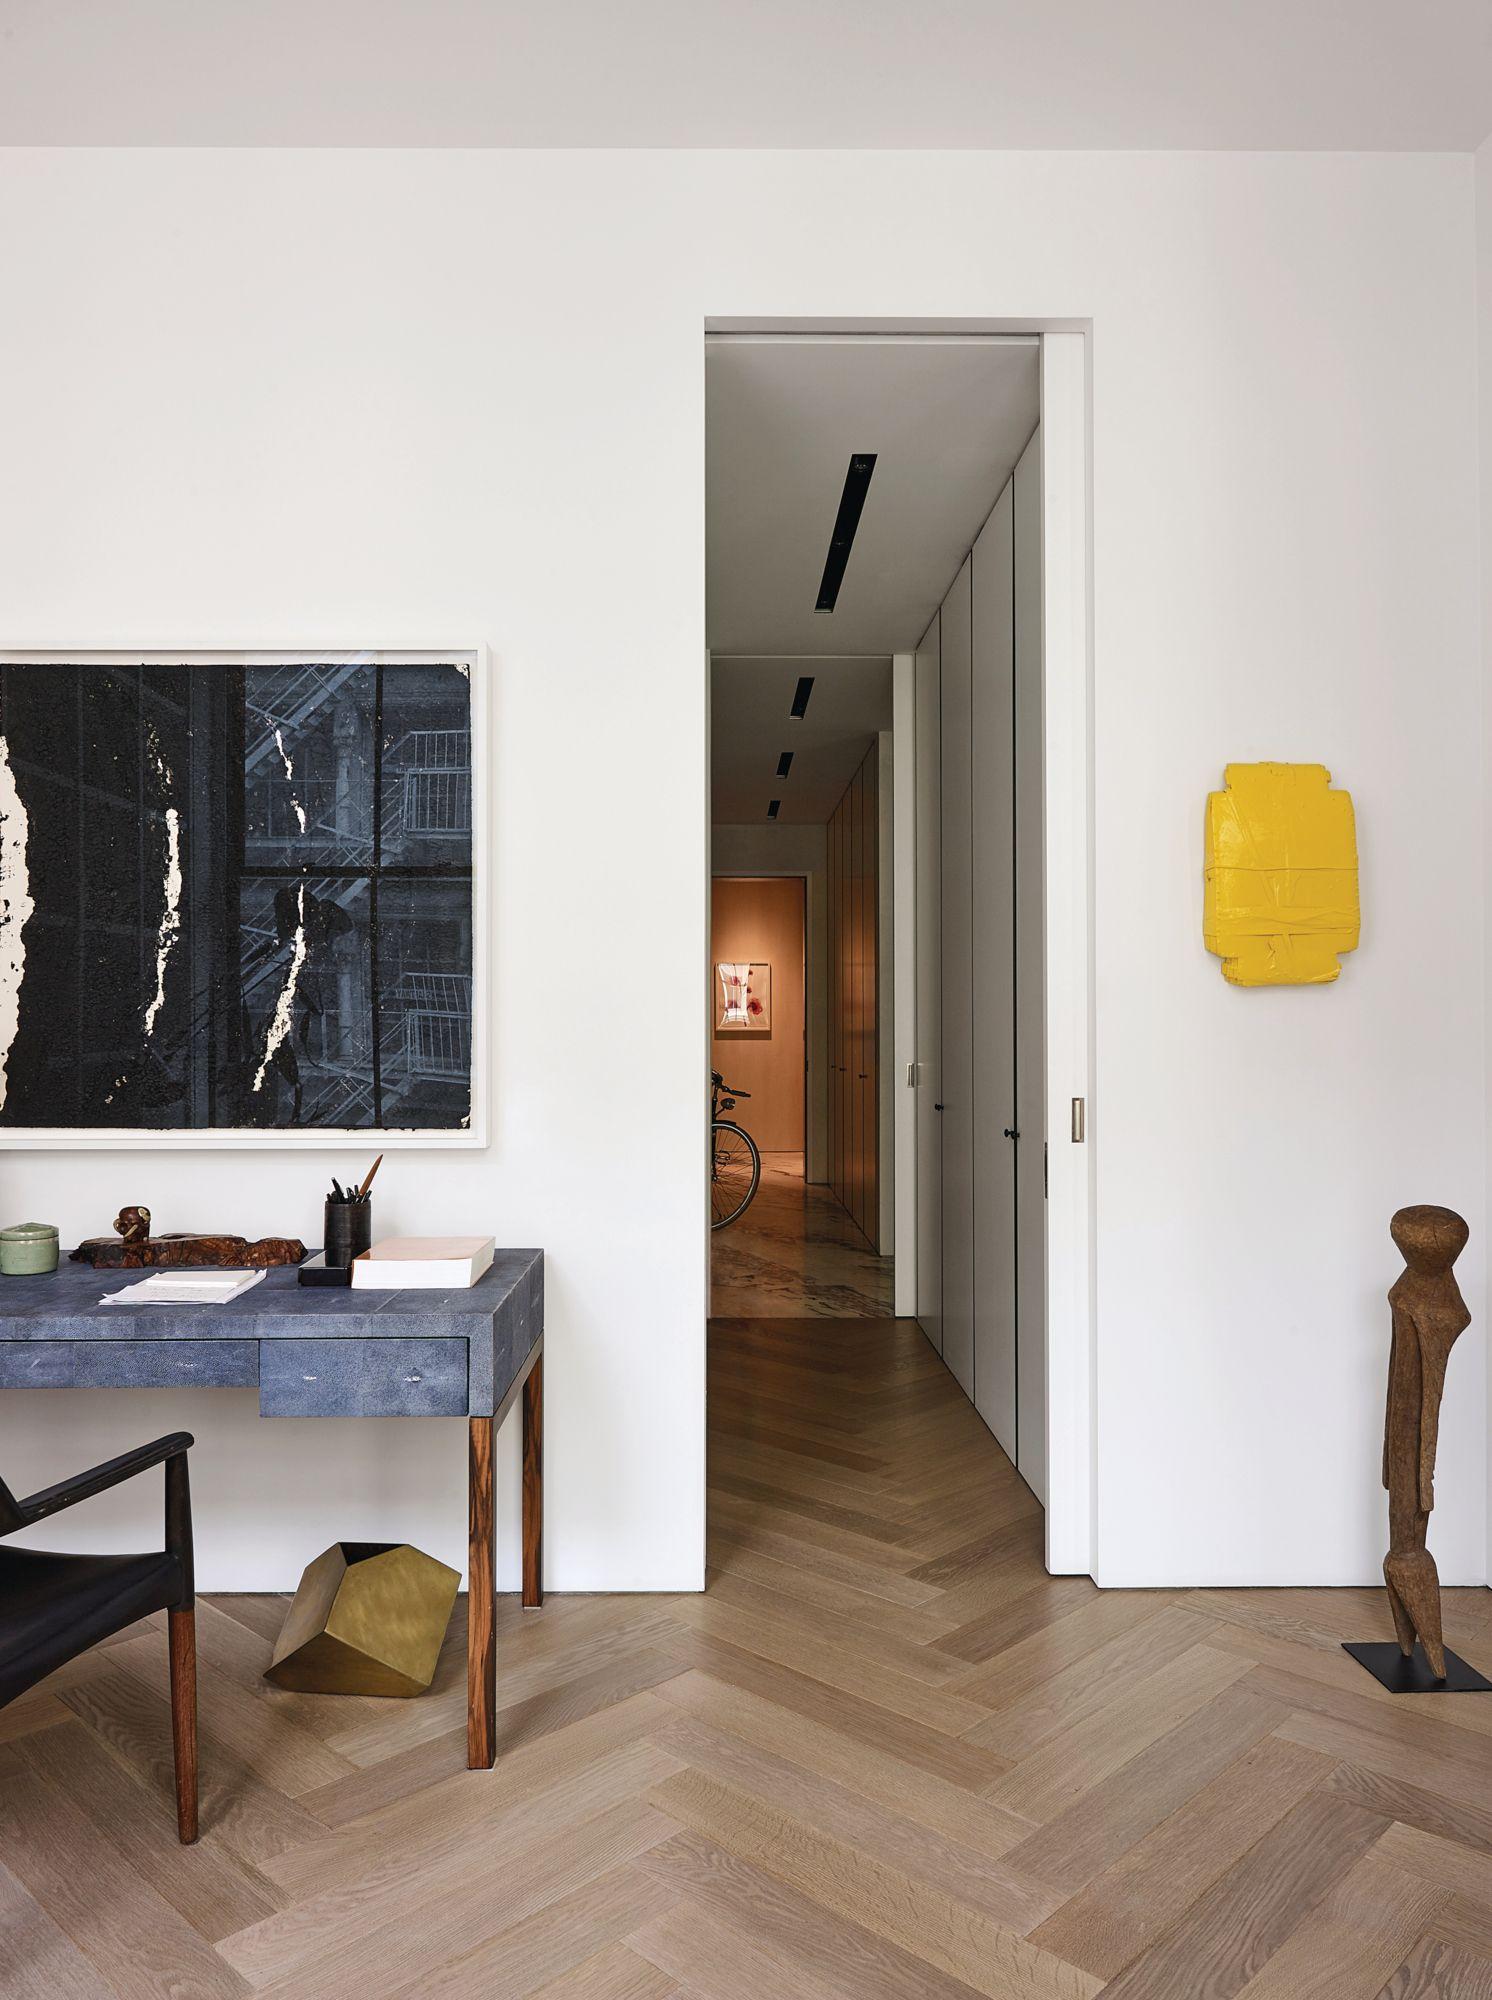 Phillip Lim 的辦公室掛著 Richard Serra 的畫作和 Helmut Lang 的黃色雕塑。(Photo: Wichmann + Bendtsen for Tatler Hong Kong)